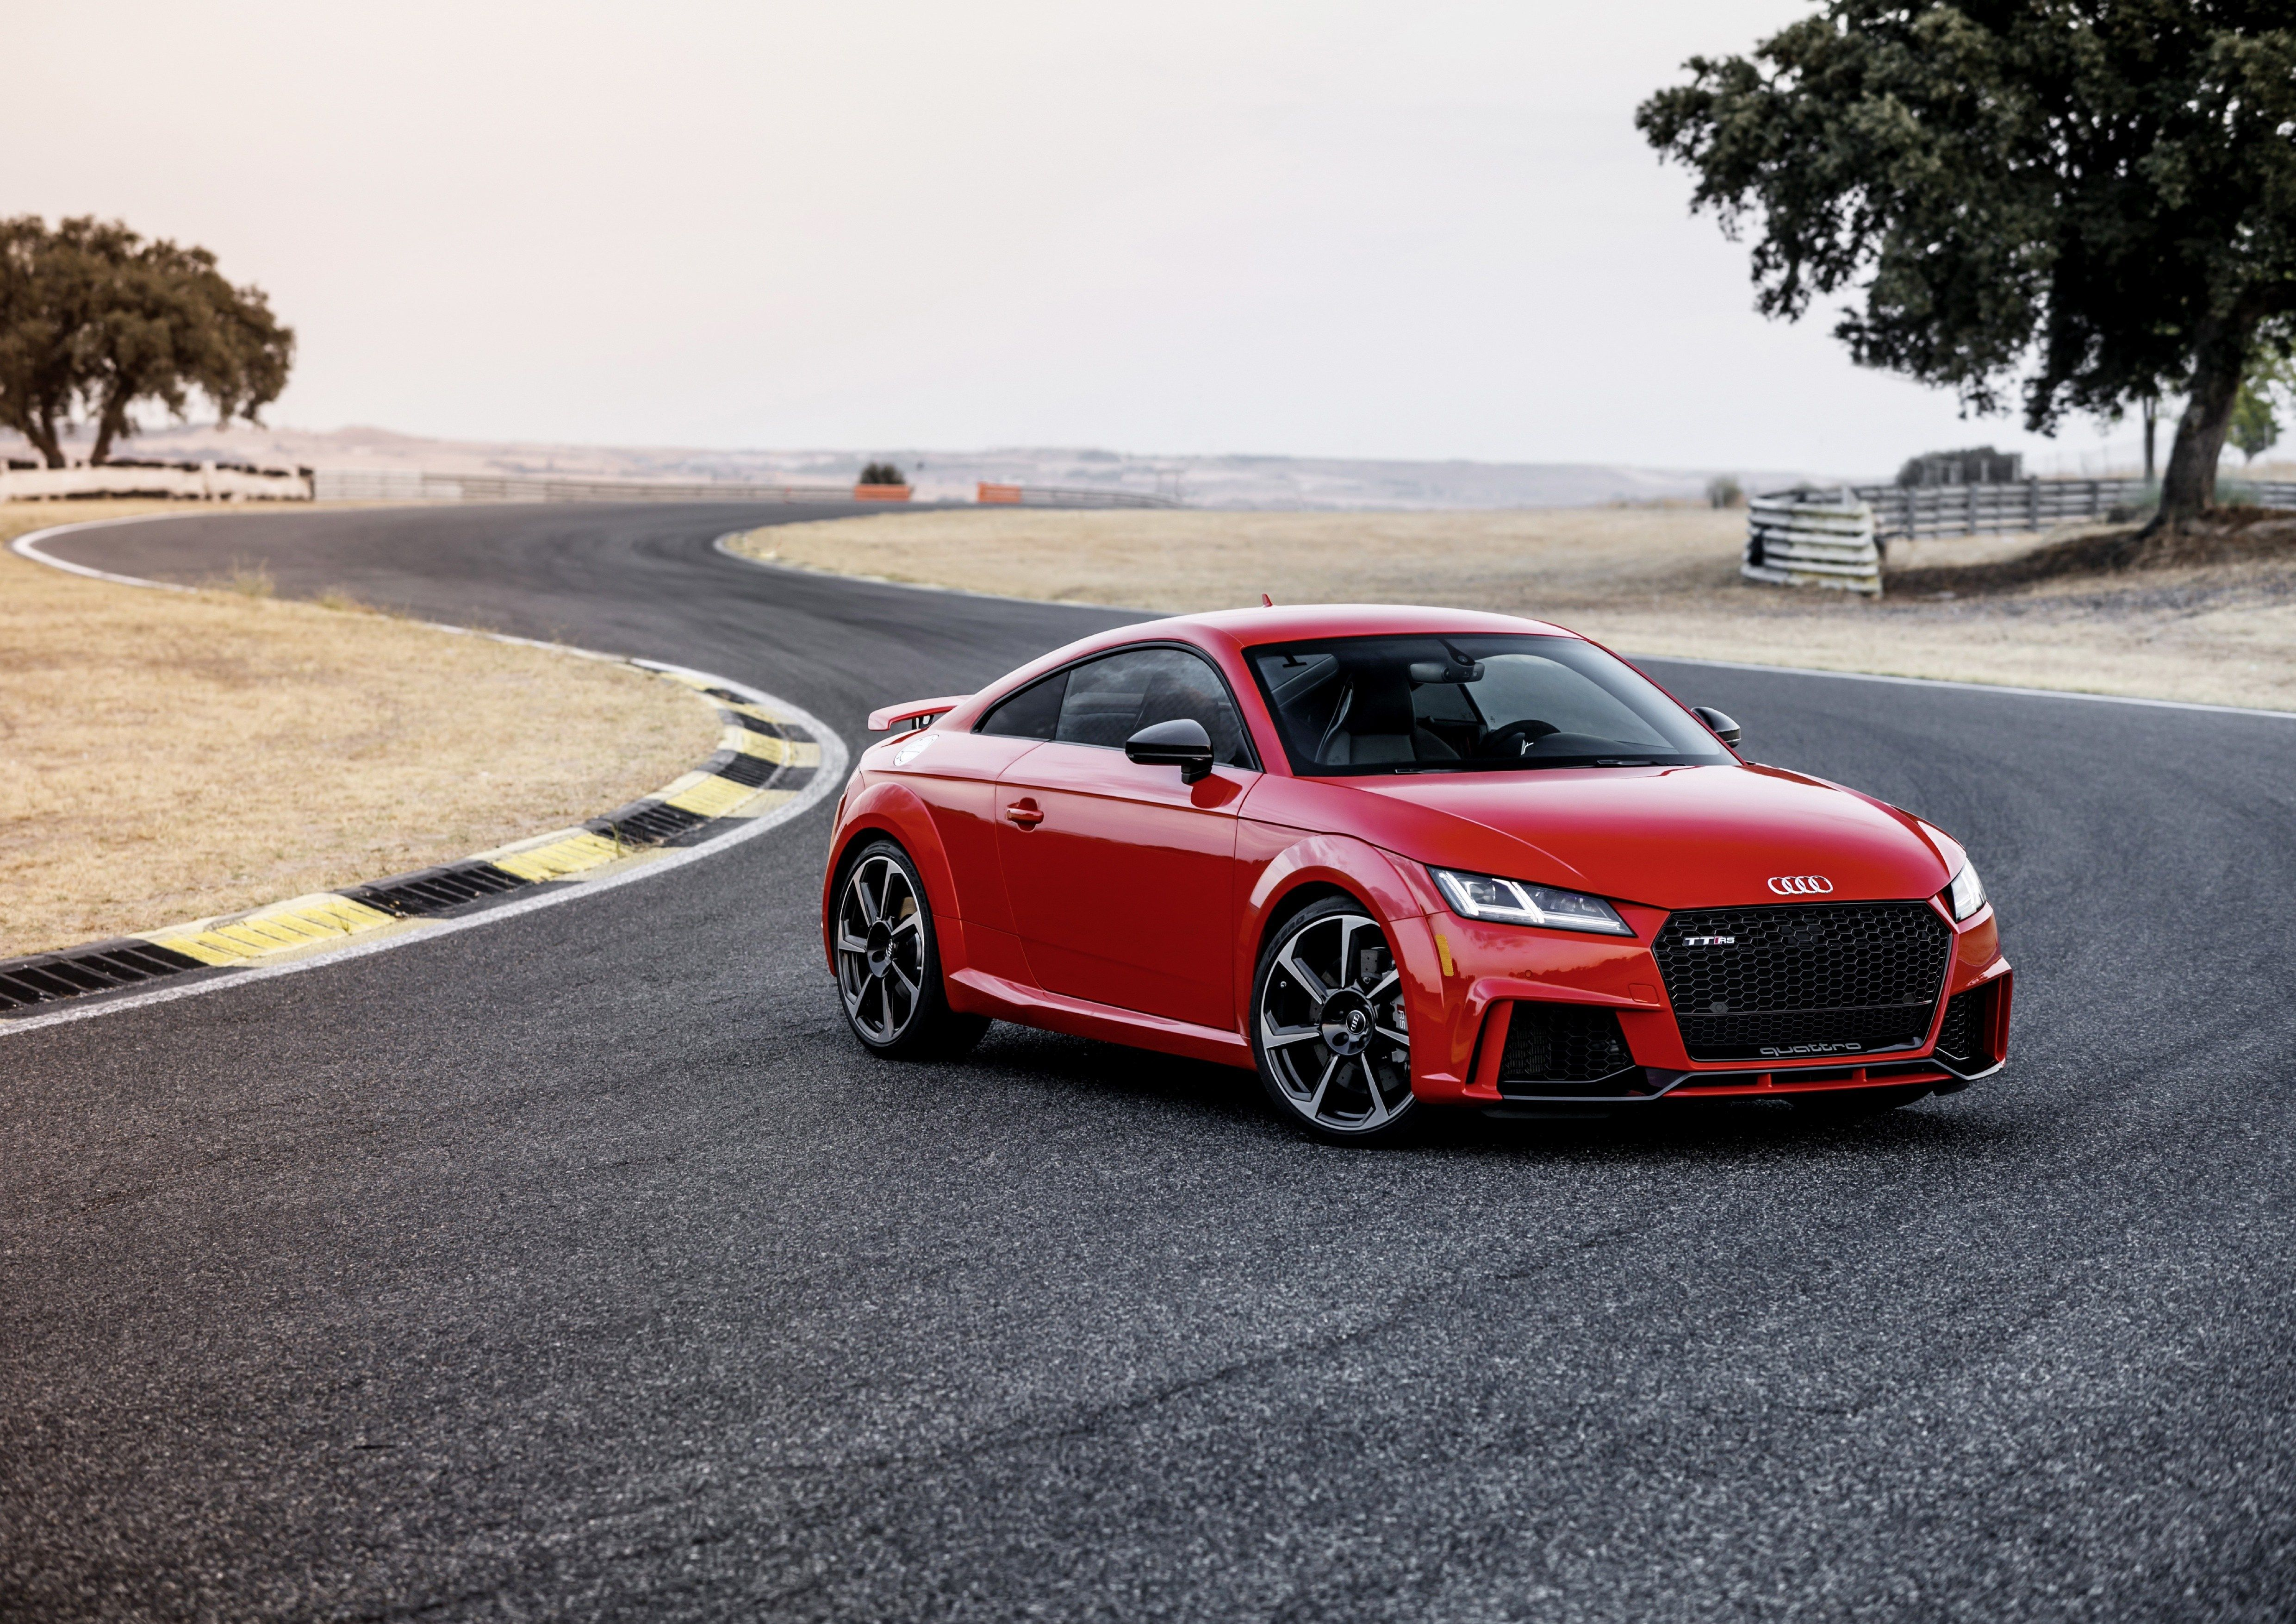 4k Audi Tt Wallpapers Top Free 4k Audi Tt Backgrounds Wallpaperaccess